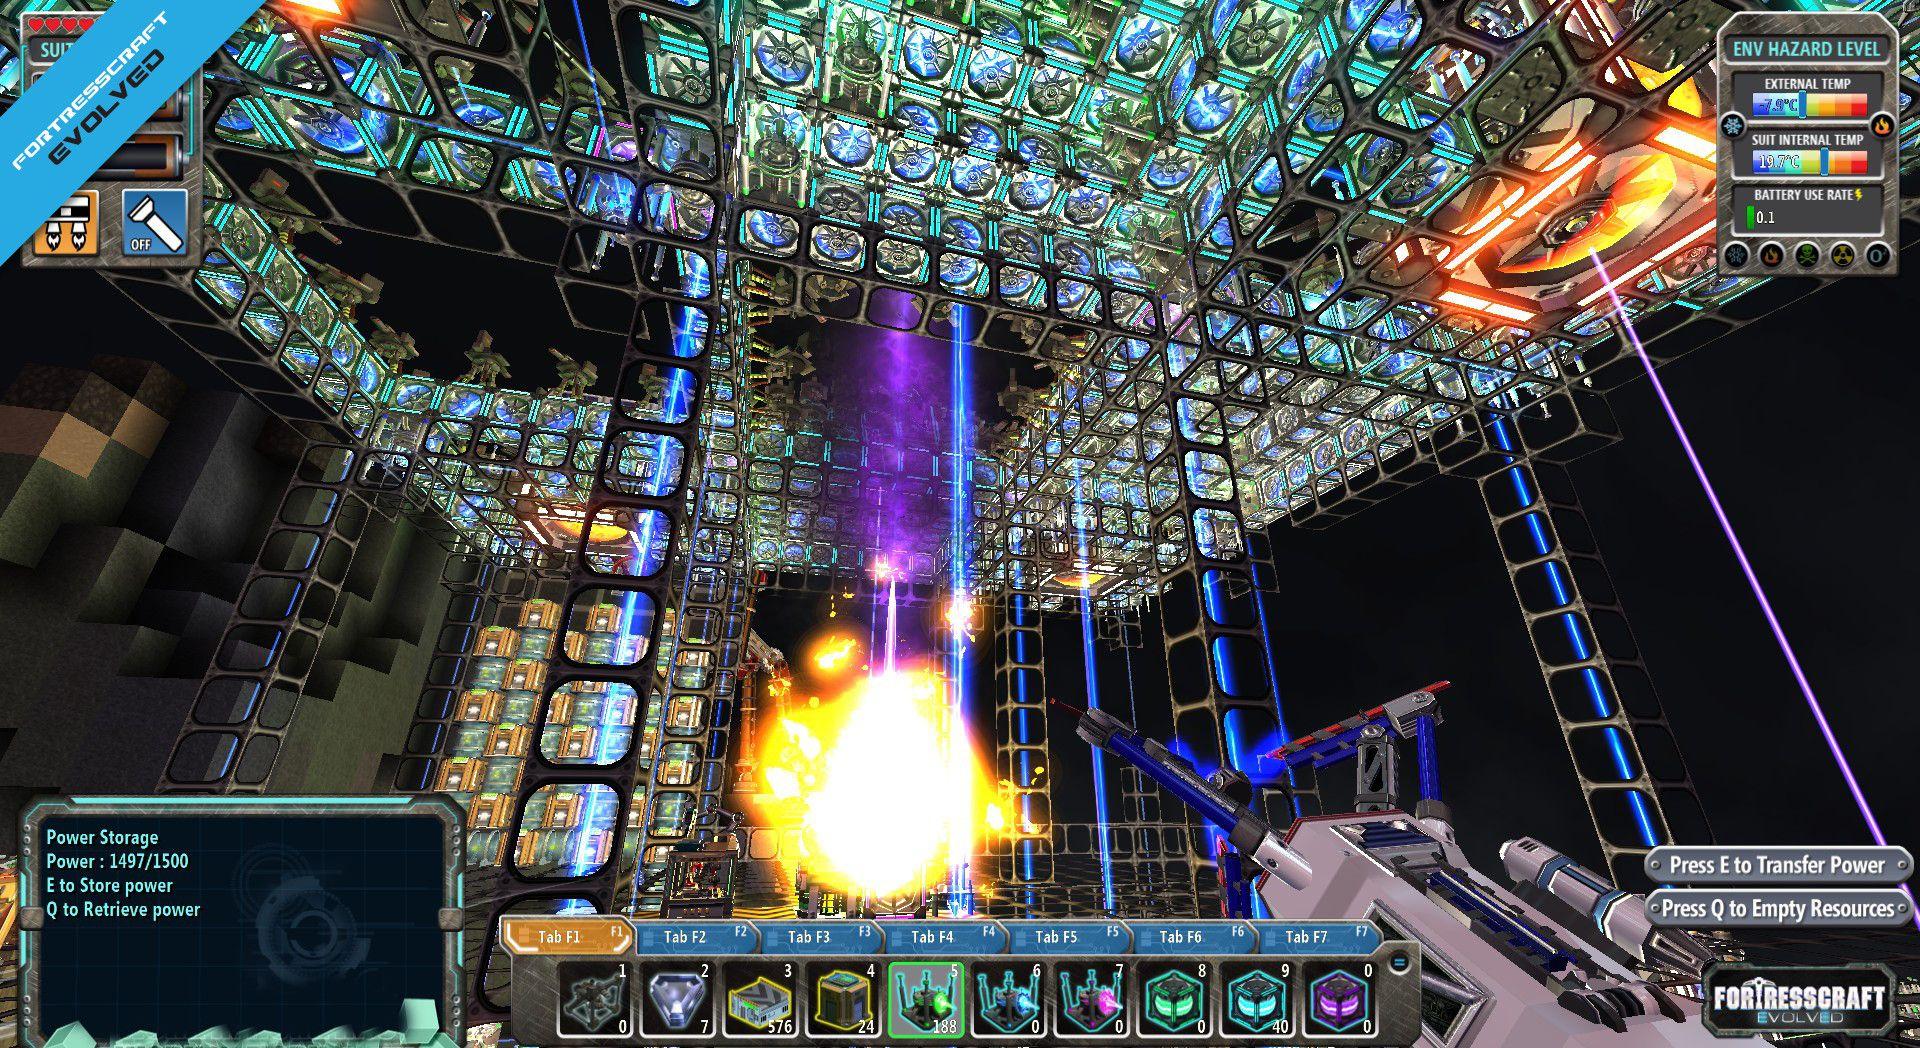 Скриншот FortressCraft: Evolved v11.11b №3